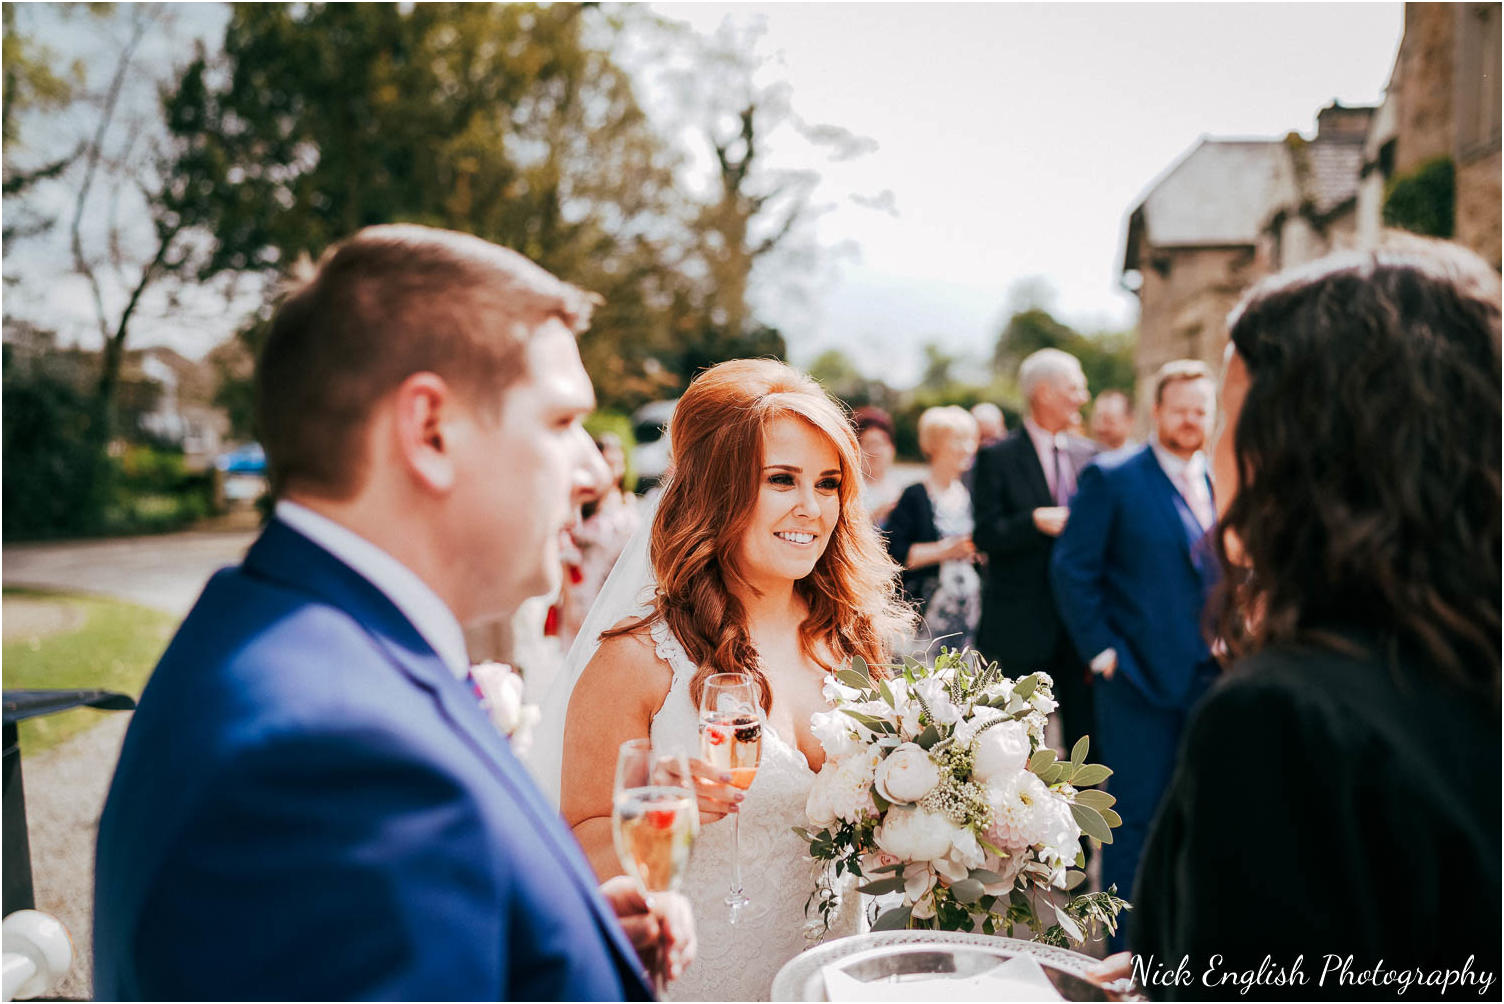 Mitton_Hall_Wedding_Photographer-102.jpg